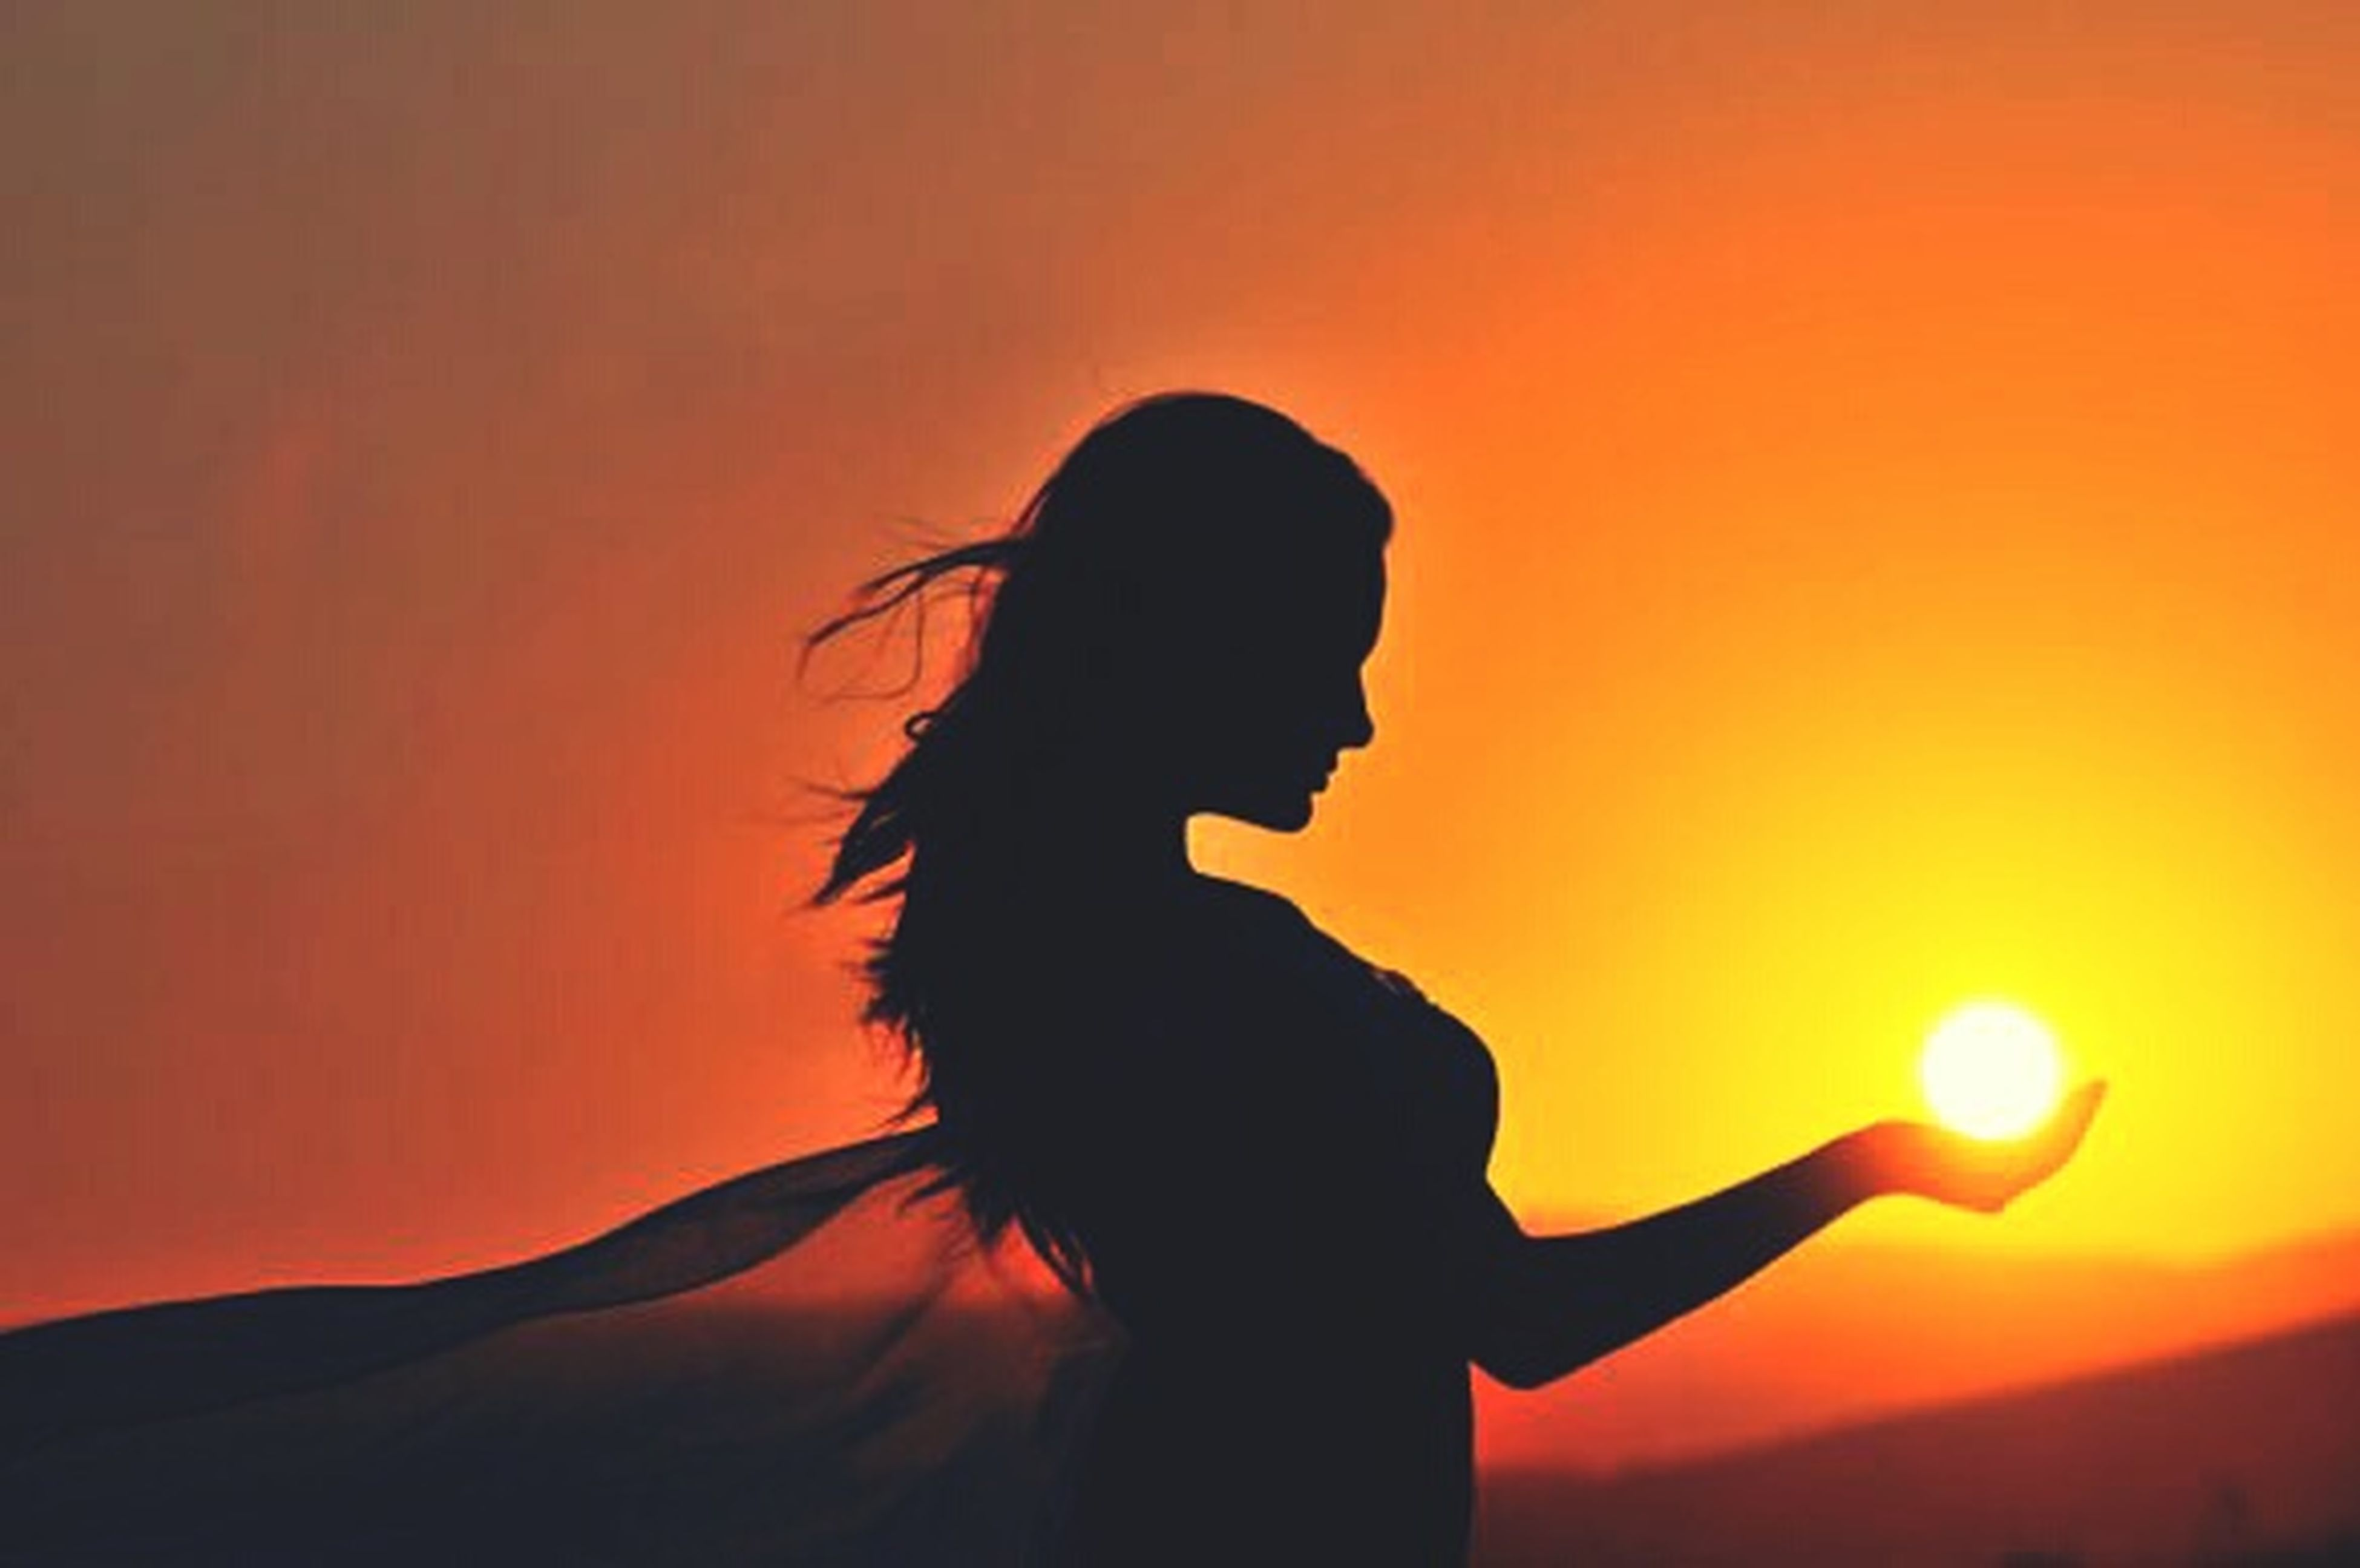 Sunset One Woman Only Nature Outdoors @EyeEmNatureLover Telukpenyu Indonesia Banget Hiii... Harry Prima I Still Waiting For You